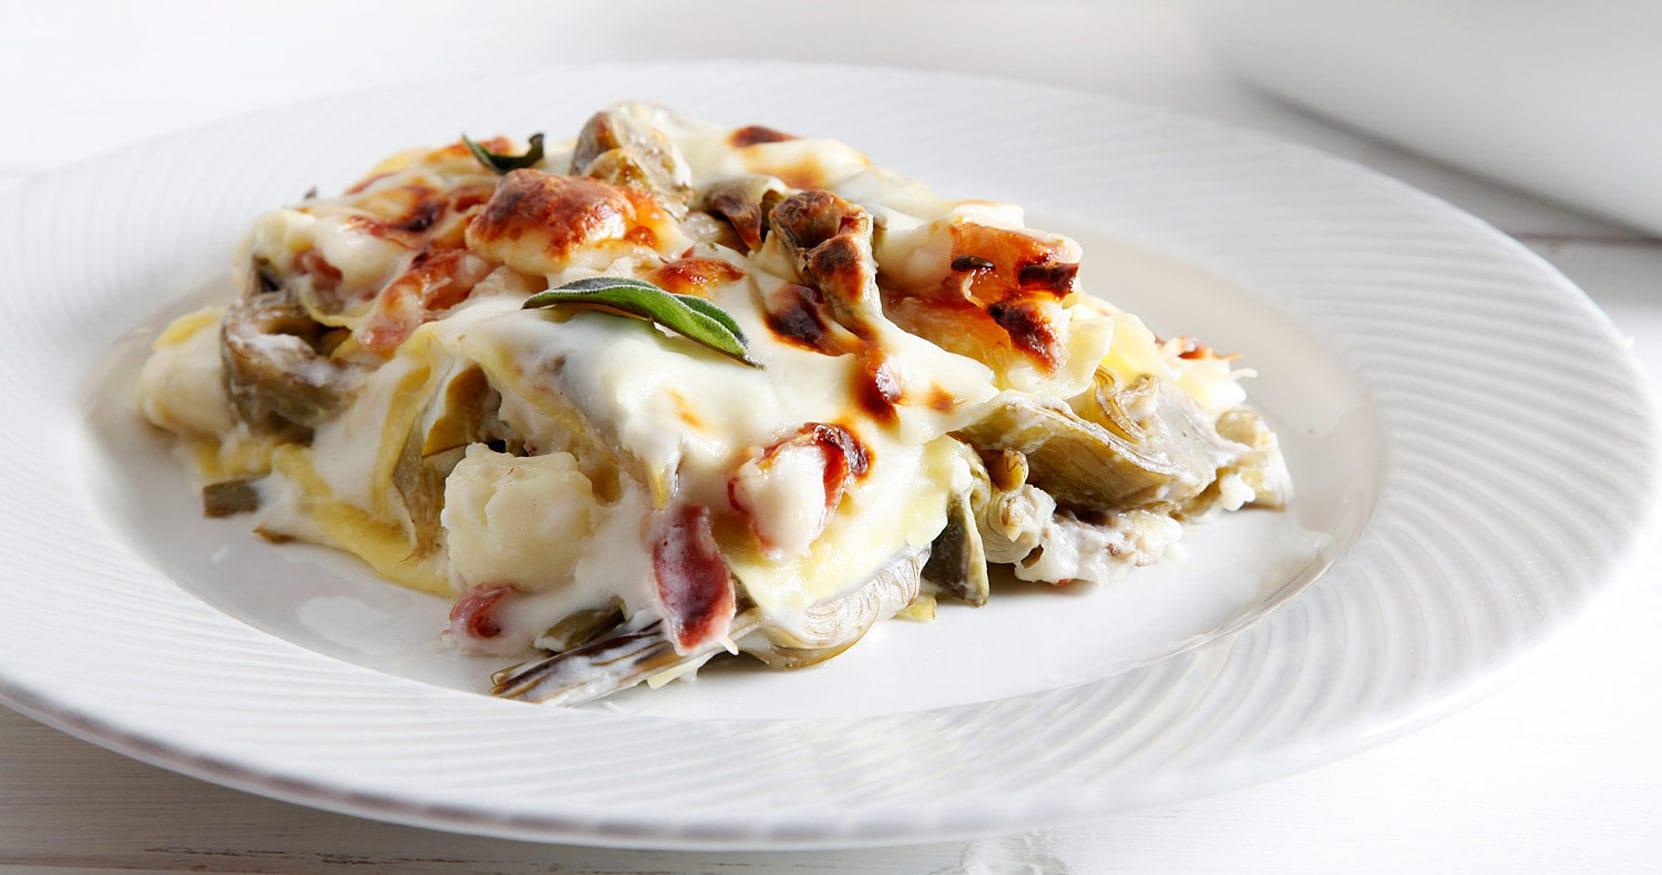 [Video] Lasagne ai carciofi, taleggio e pancetta arrotolata